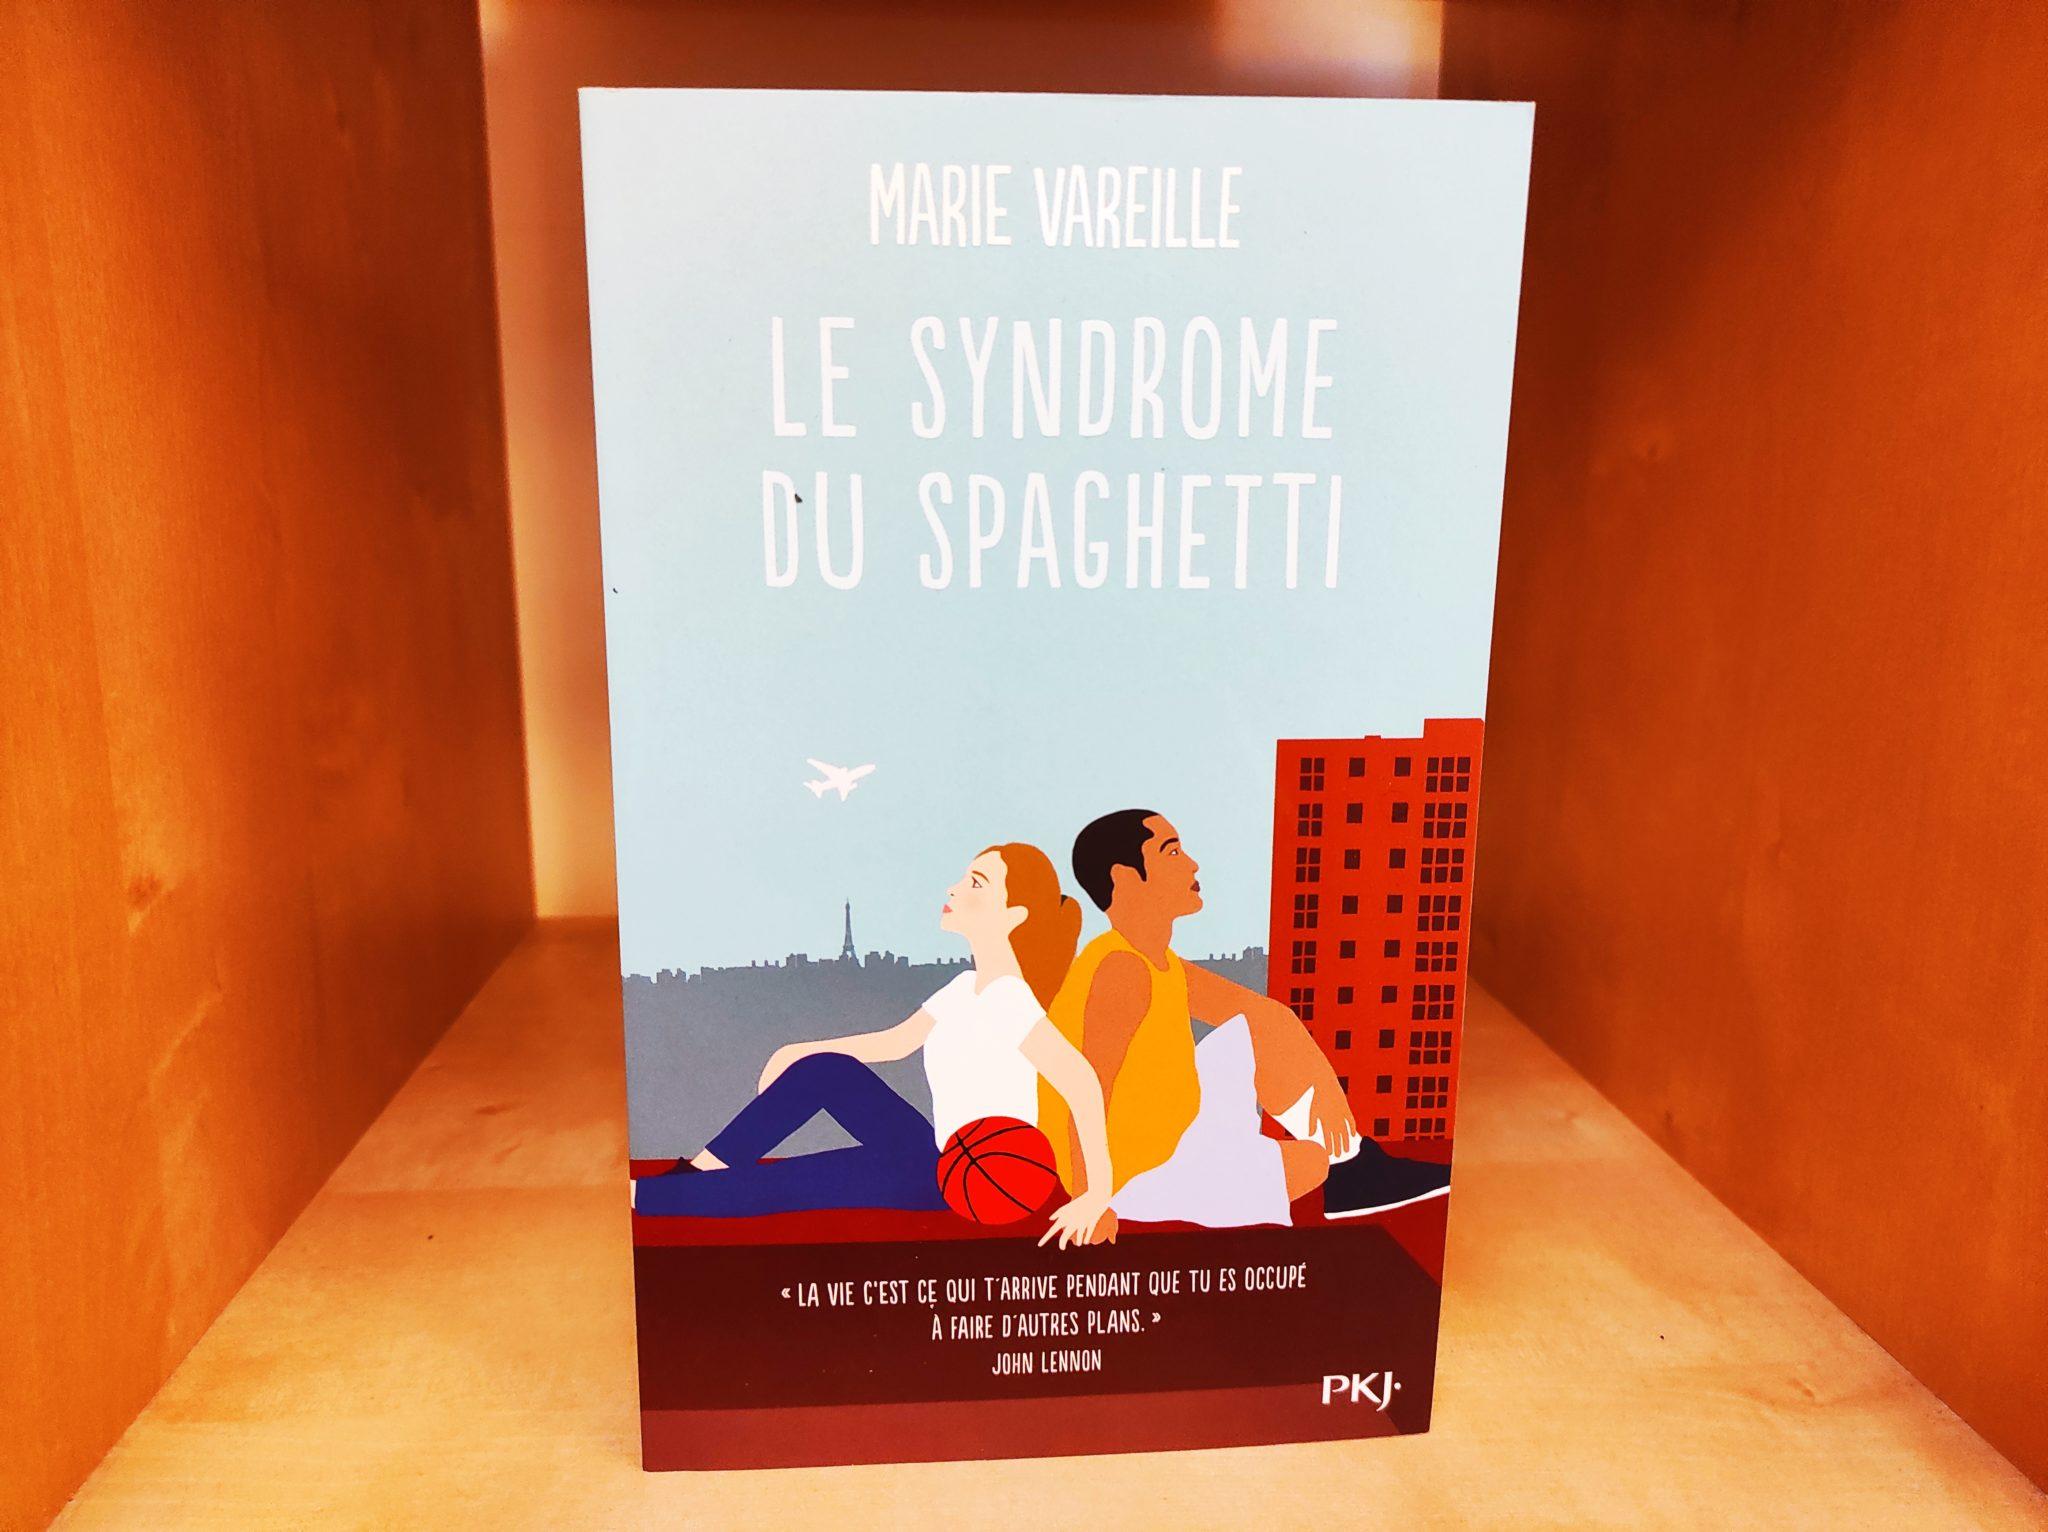 Marie Vareille Le Syndrome du Spaghetti